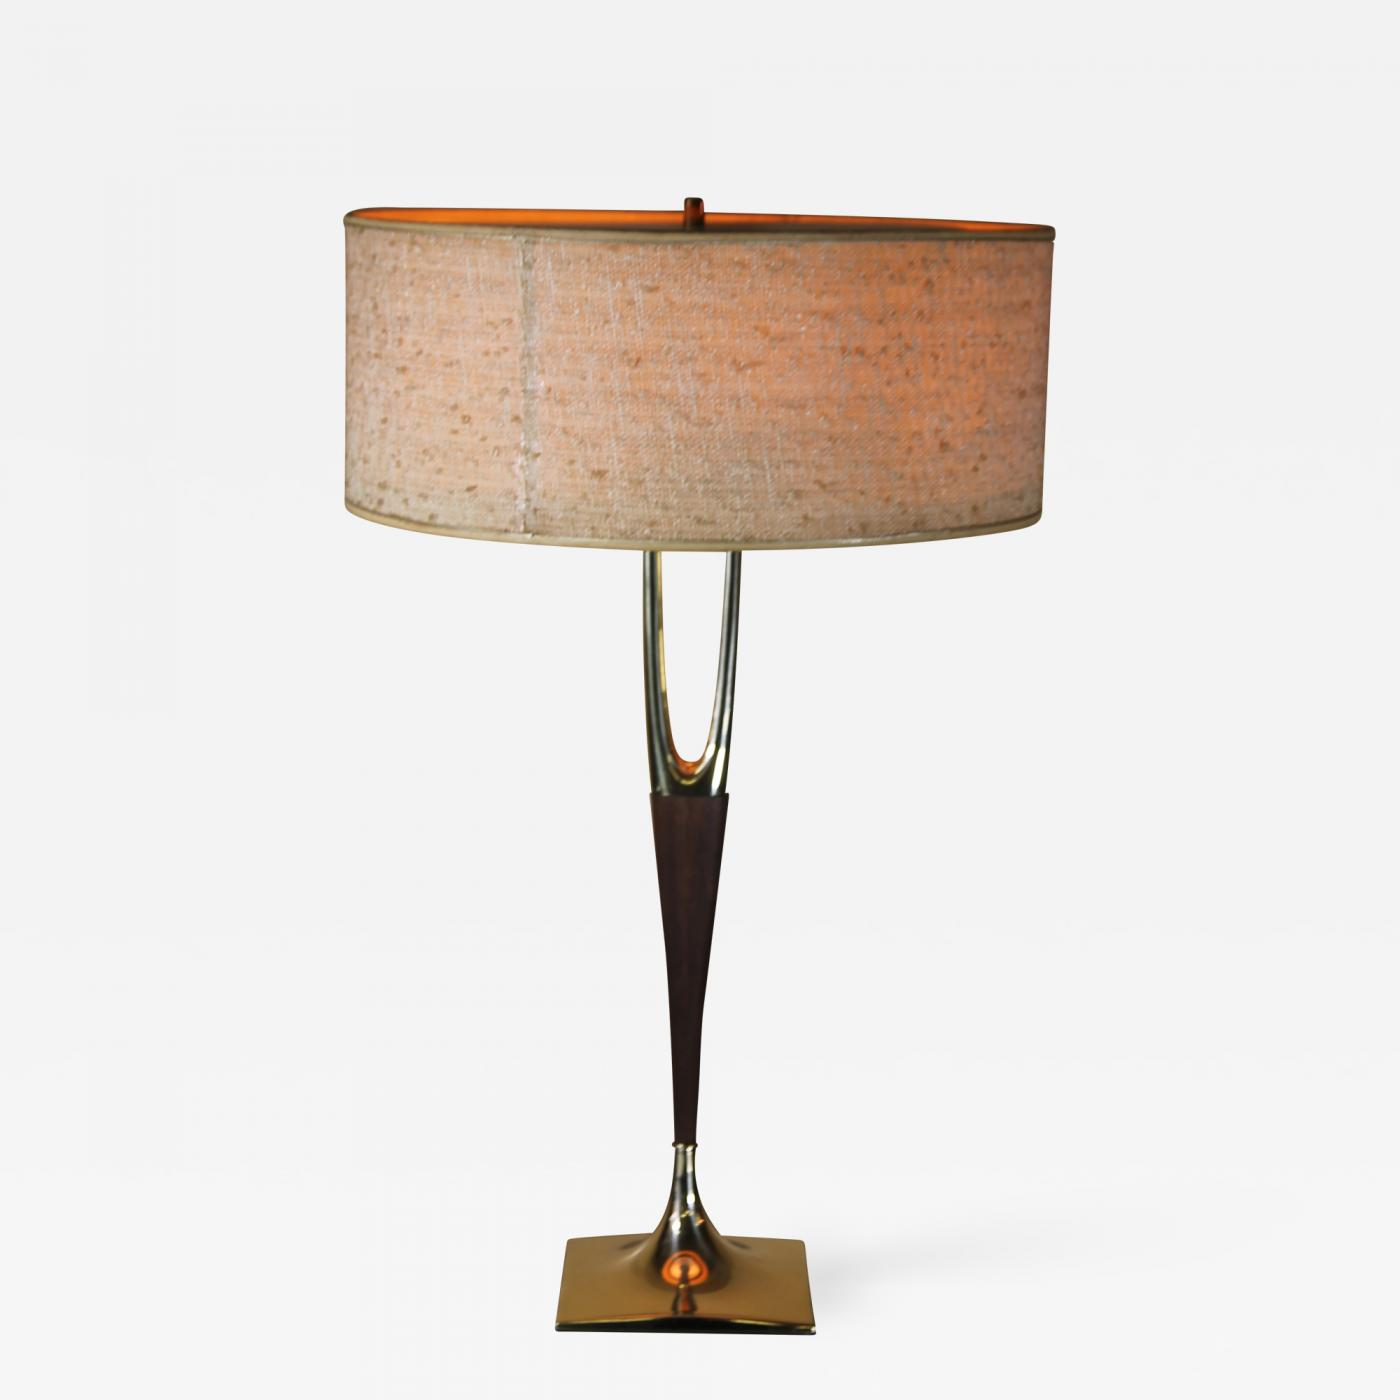 Gerald Thurston Gerald Thurston For Laurel Lamp Co Wishbone Lamp